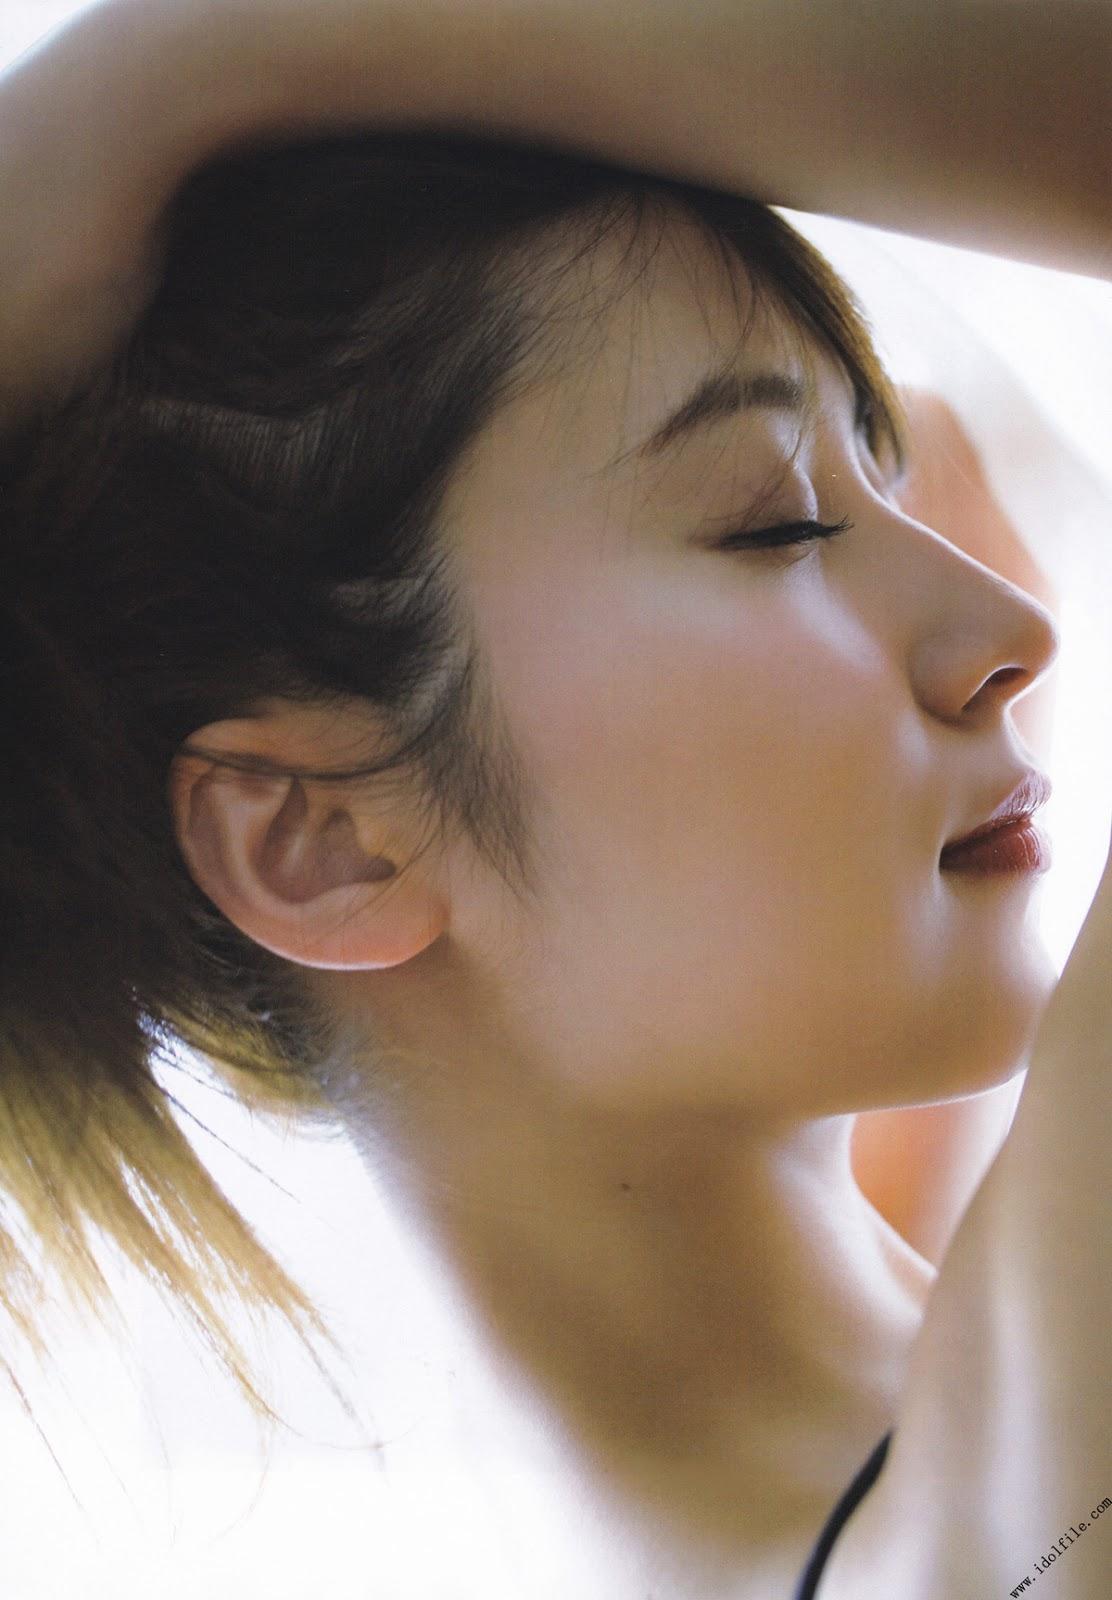 Eto Misa 衛藤美彩, BRODY 2017.09 (ブロディ 2017年9月号)